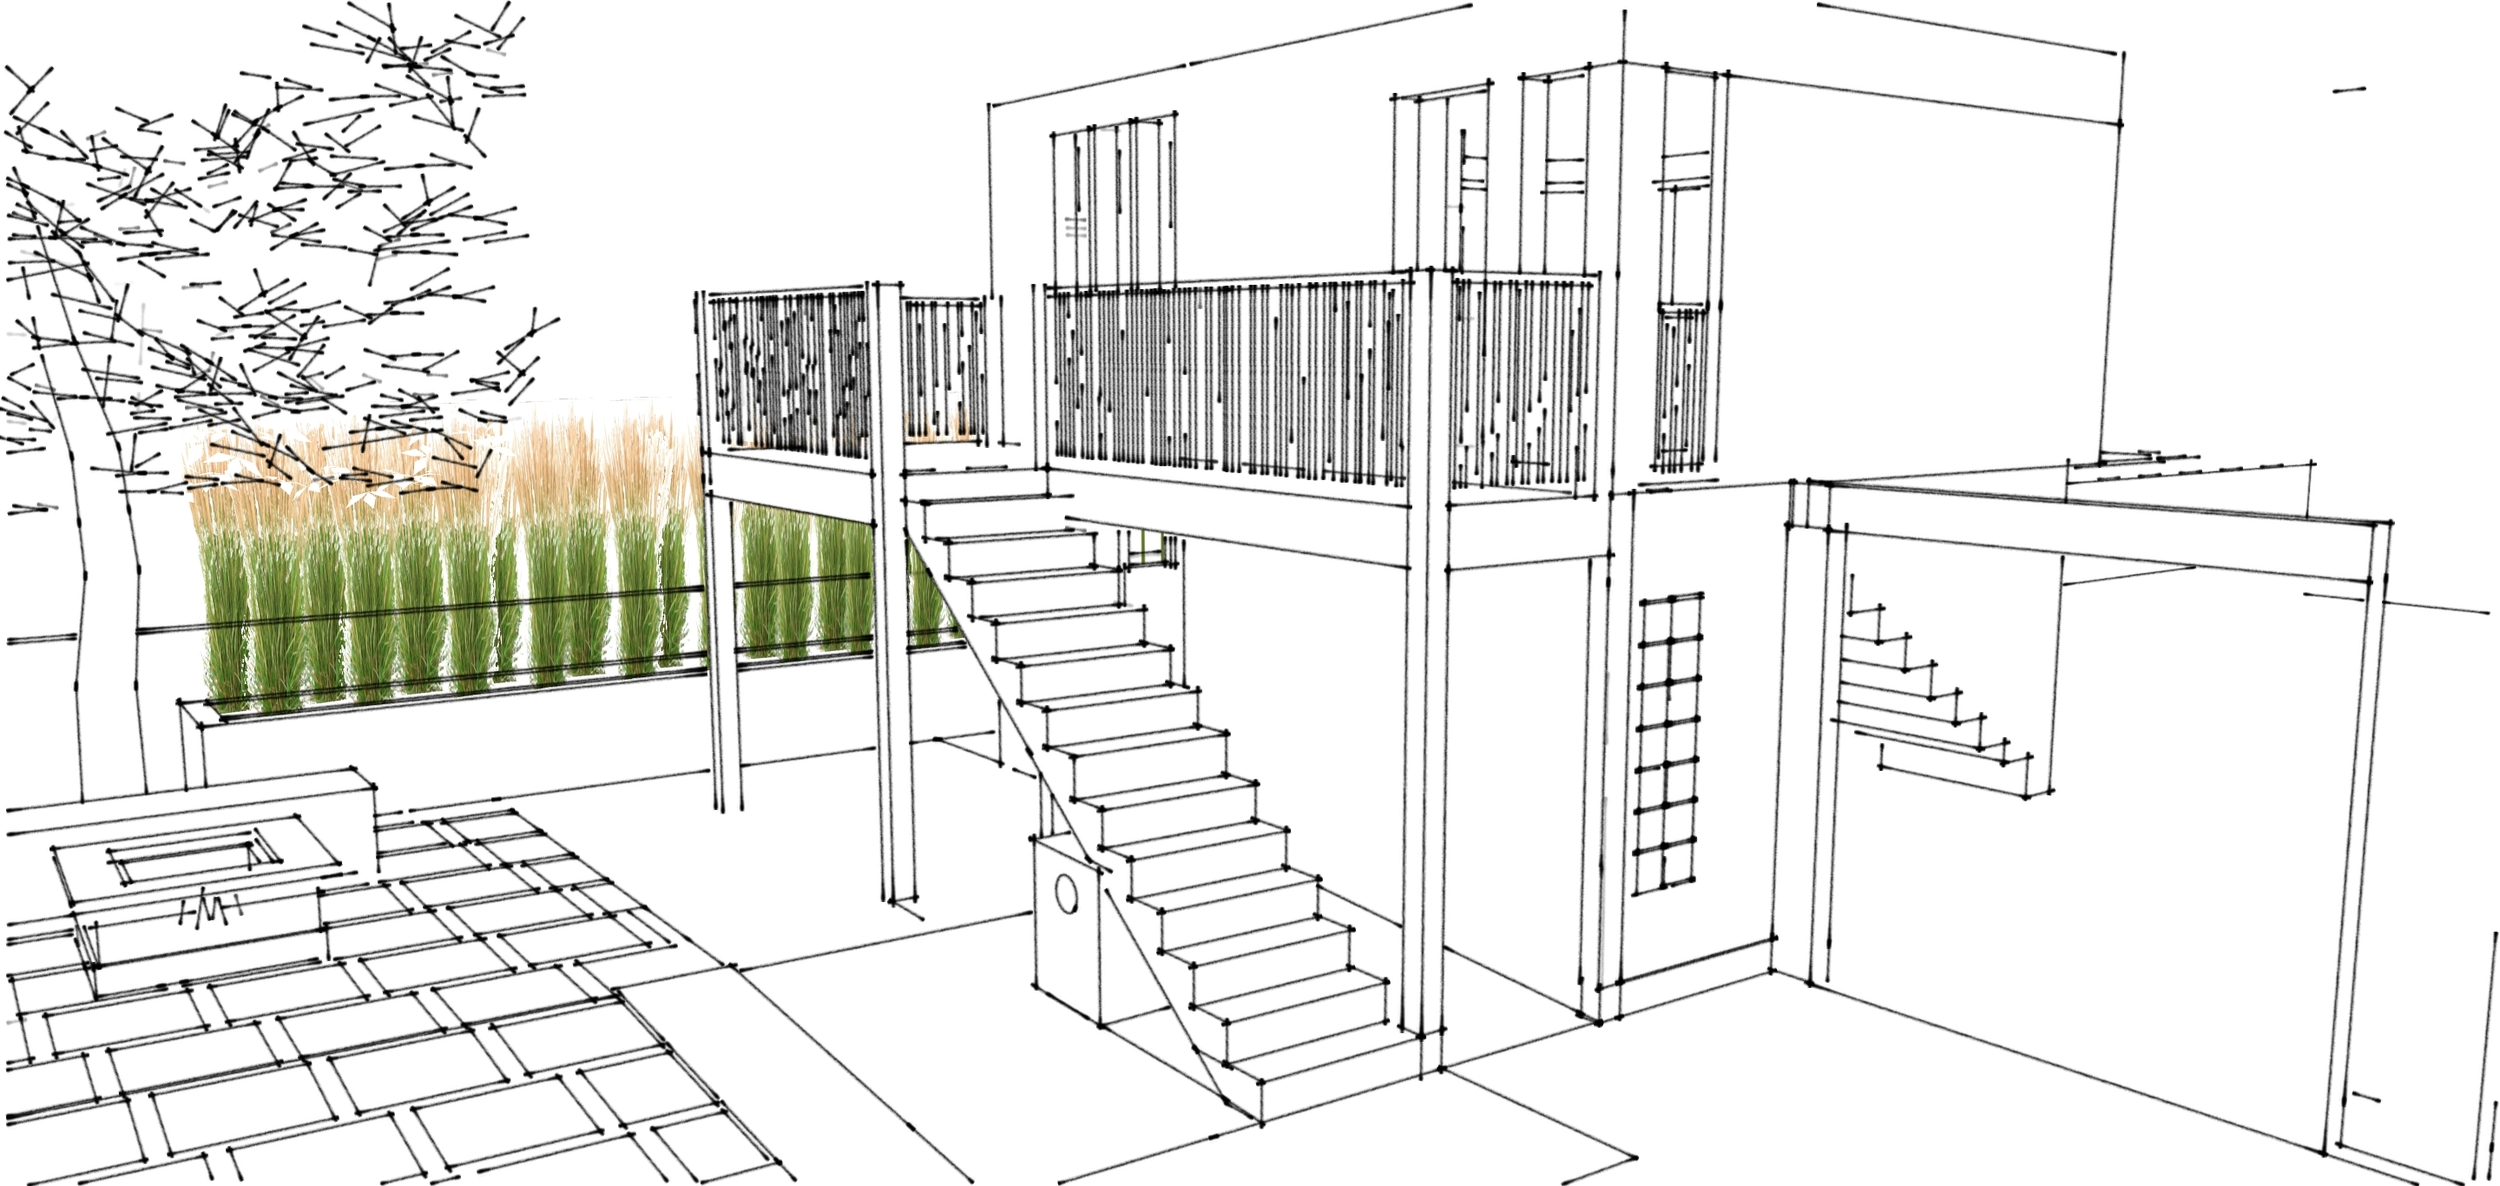 Irving Steet,San Mateo sketch up model: Design Development